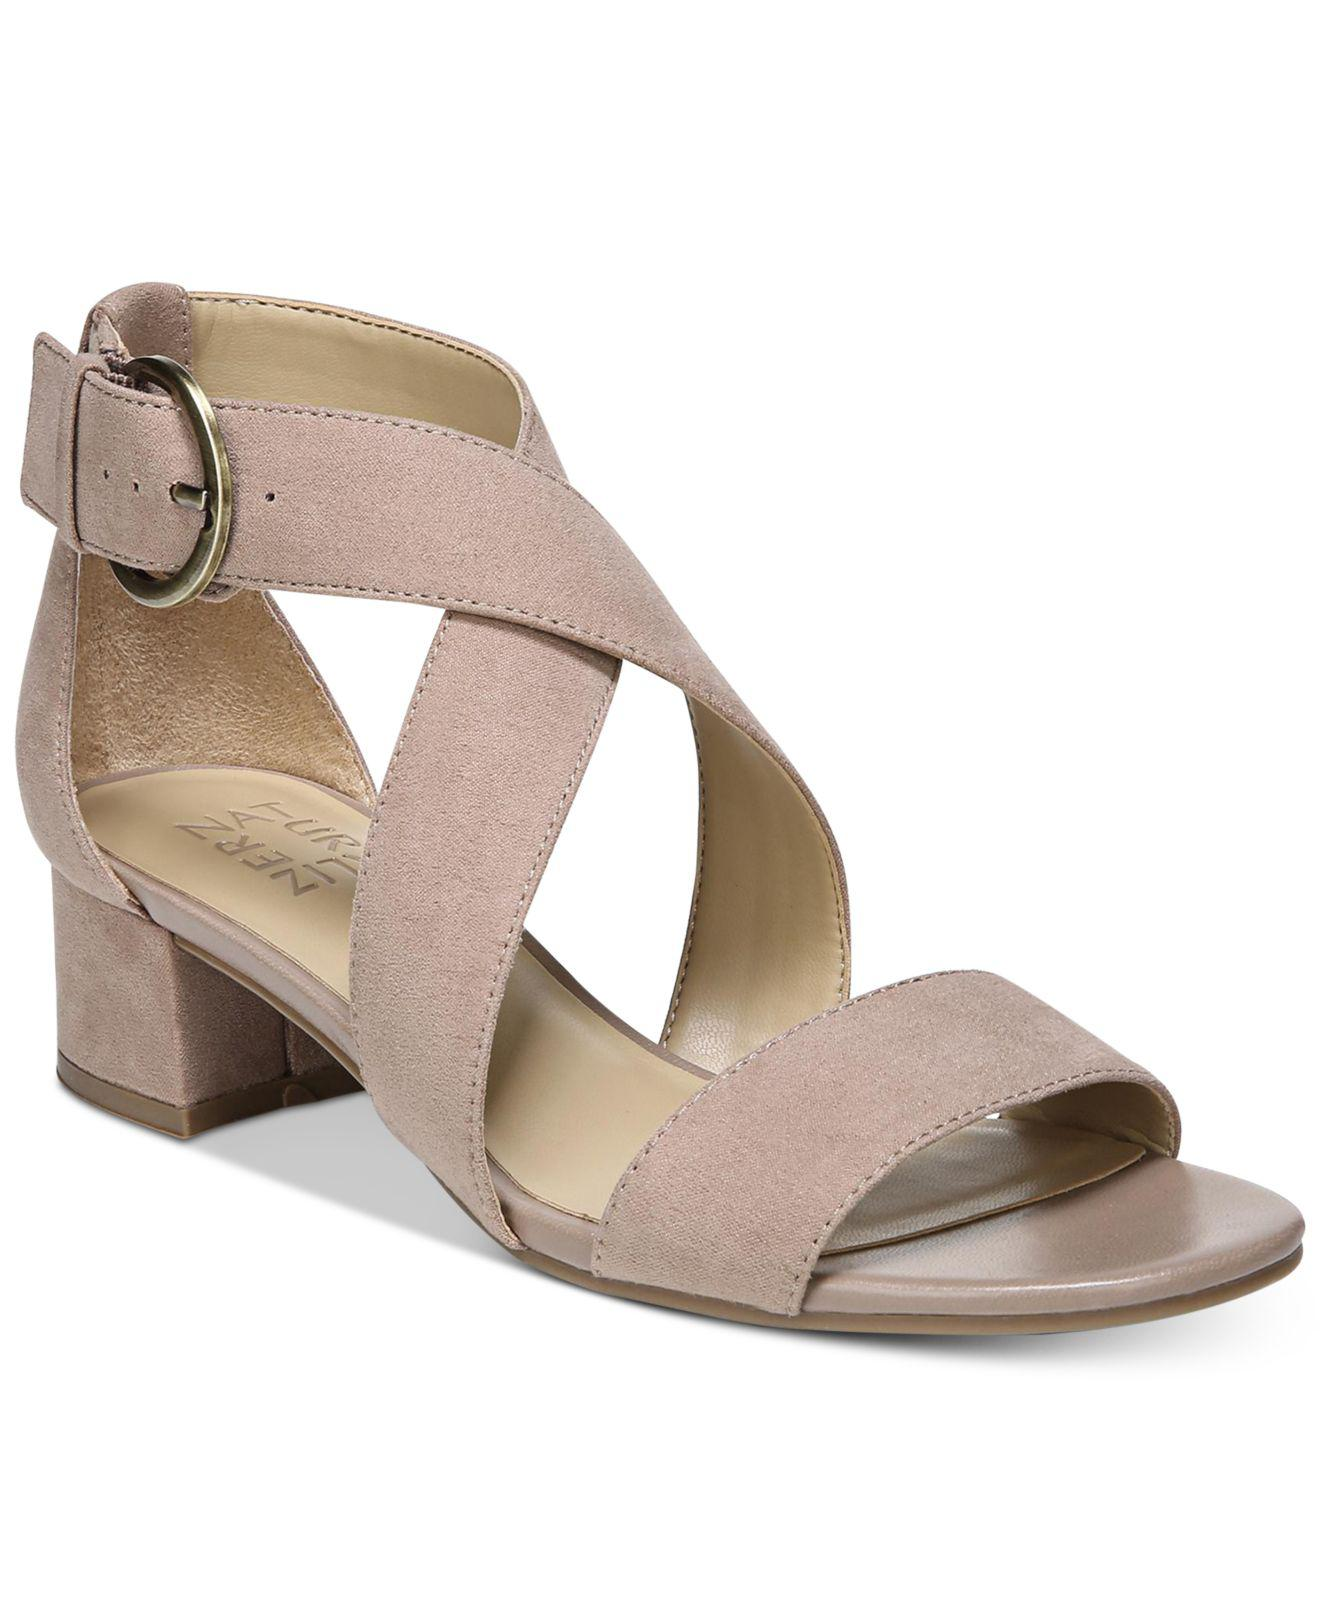 Ladies Shoes – Finding Heel